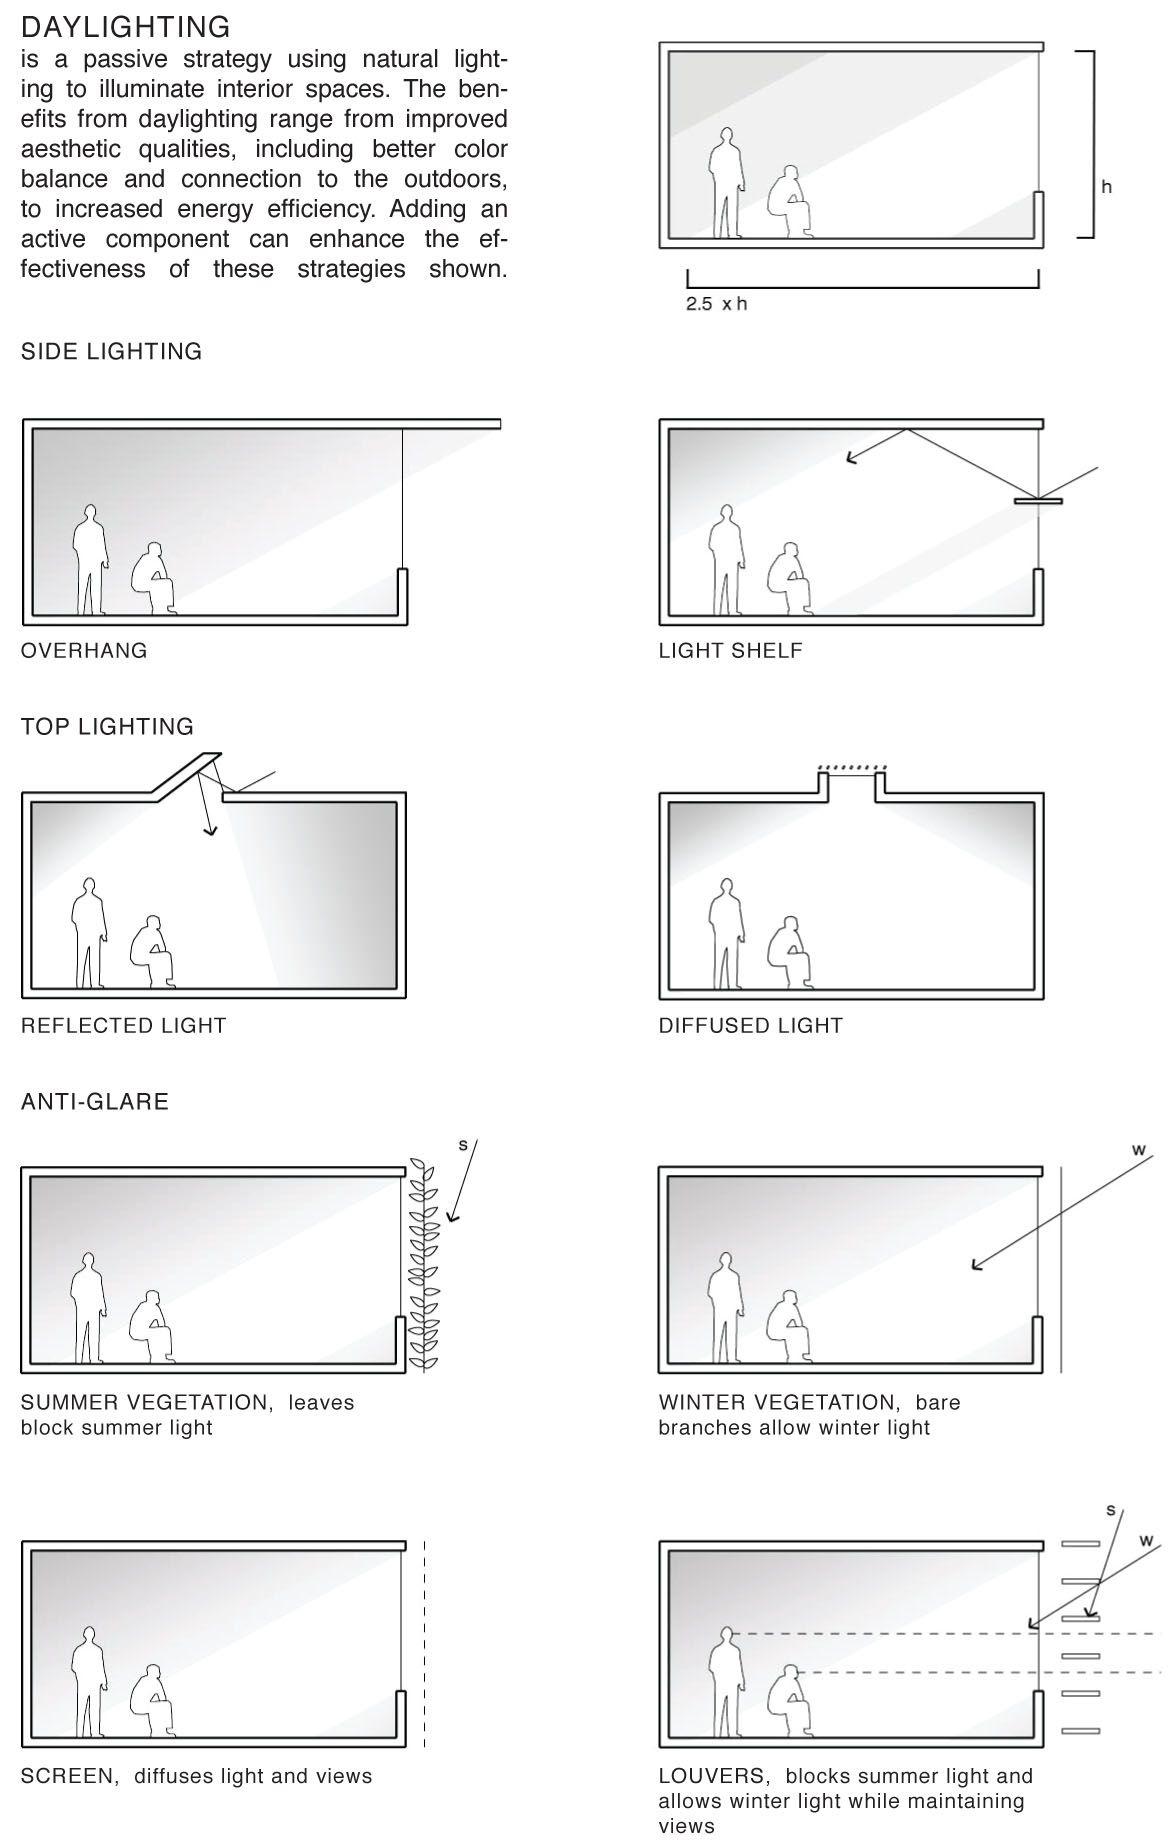 daylighting passive strategies ut zero energy house. Black Bedroom Furniture Sets. Home Design Ideas